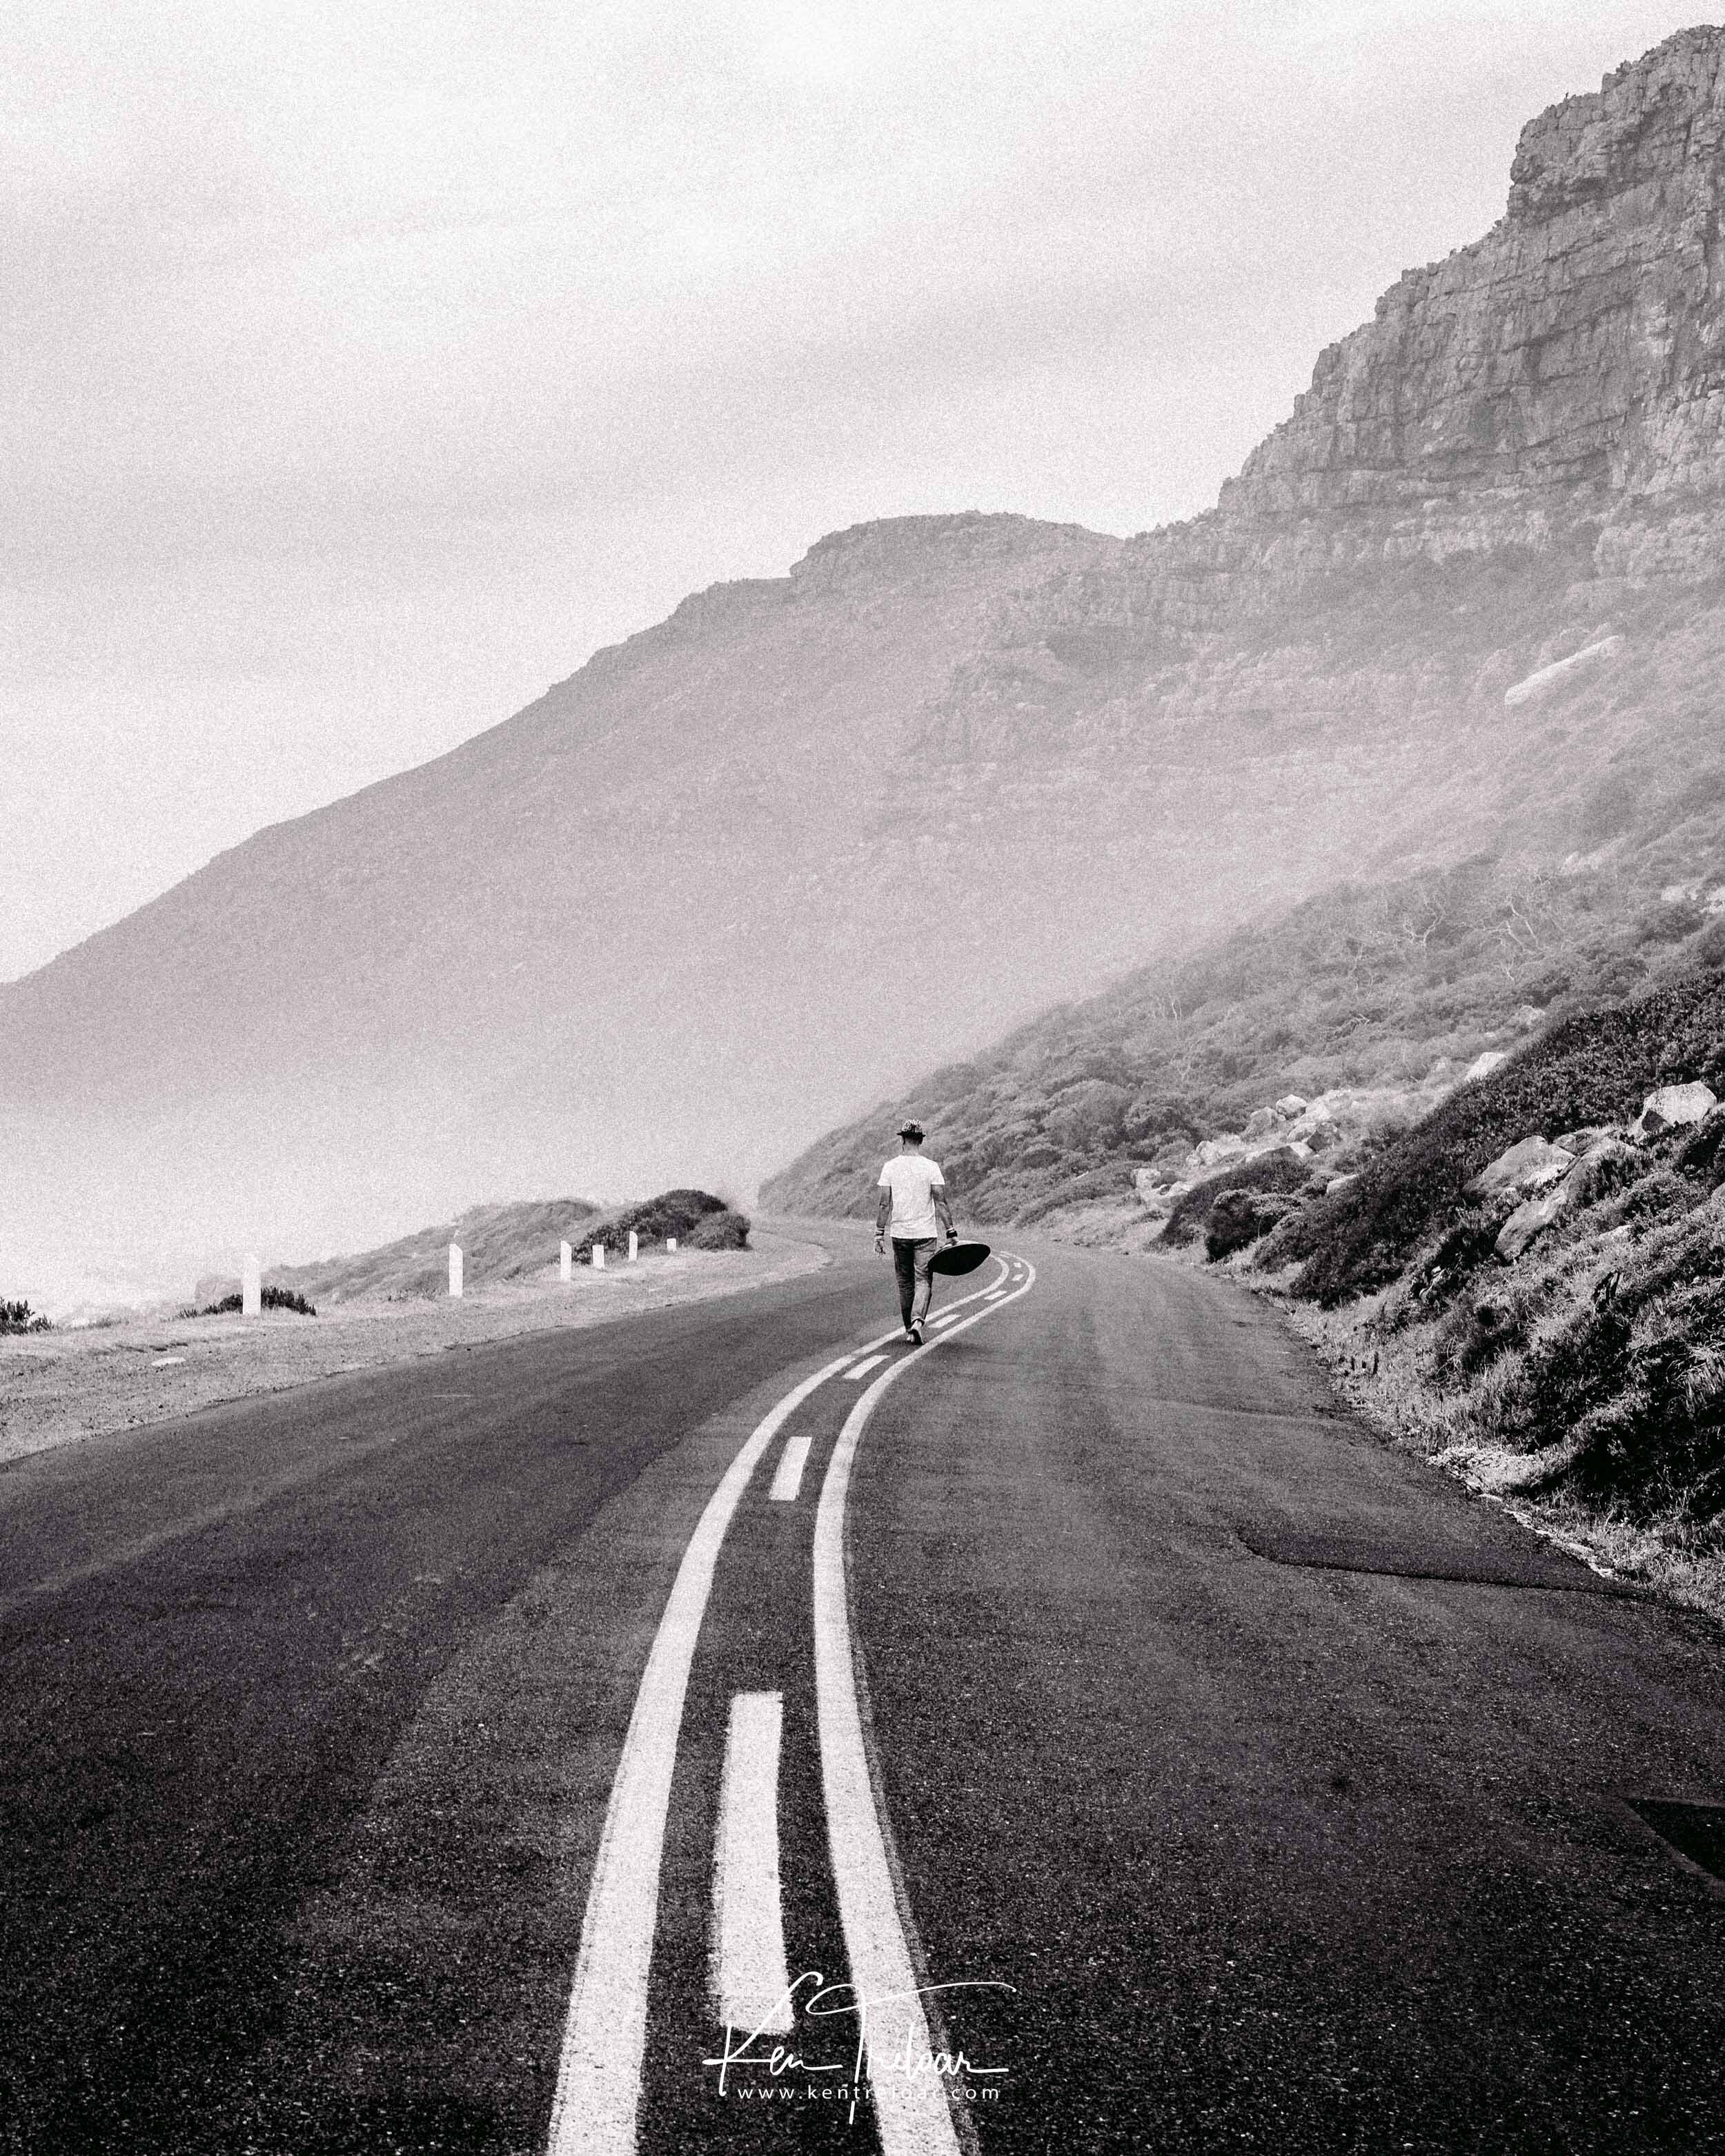 Marci Selvaggio - Hang Instrument Cape Town Tour - South Afica - Misty Cliffs -  Image by Ken Treloar-3.jpg